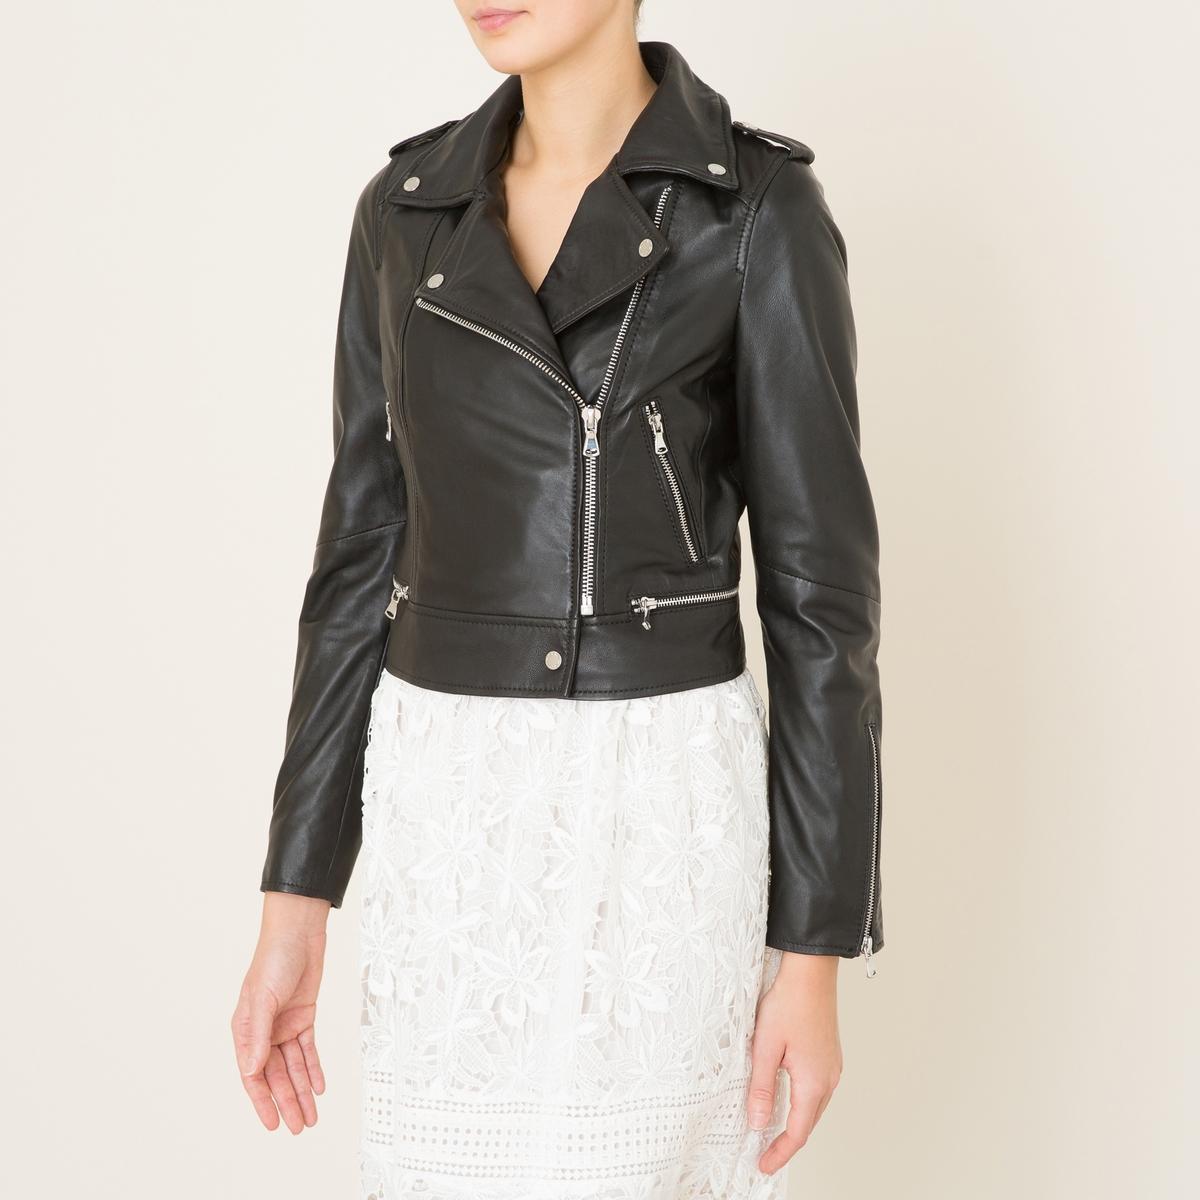 Блузон кожаный укороченный YOKO блузон кожаный